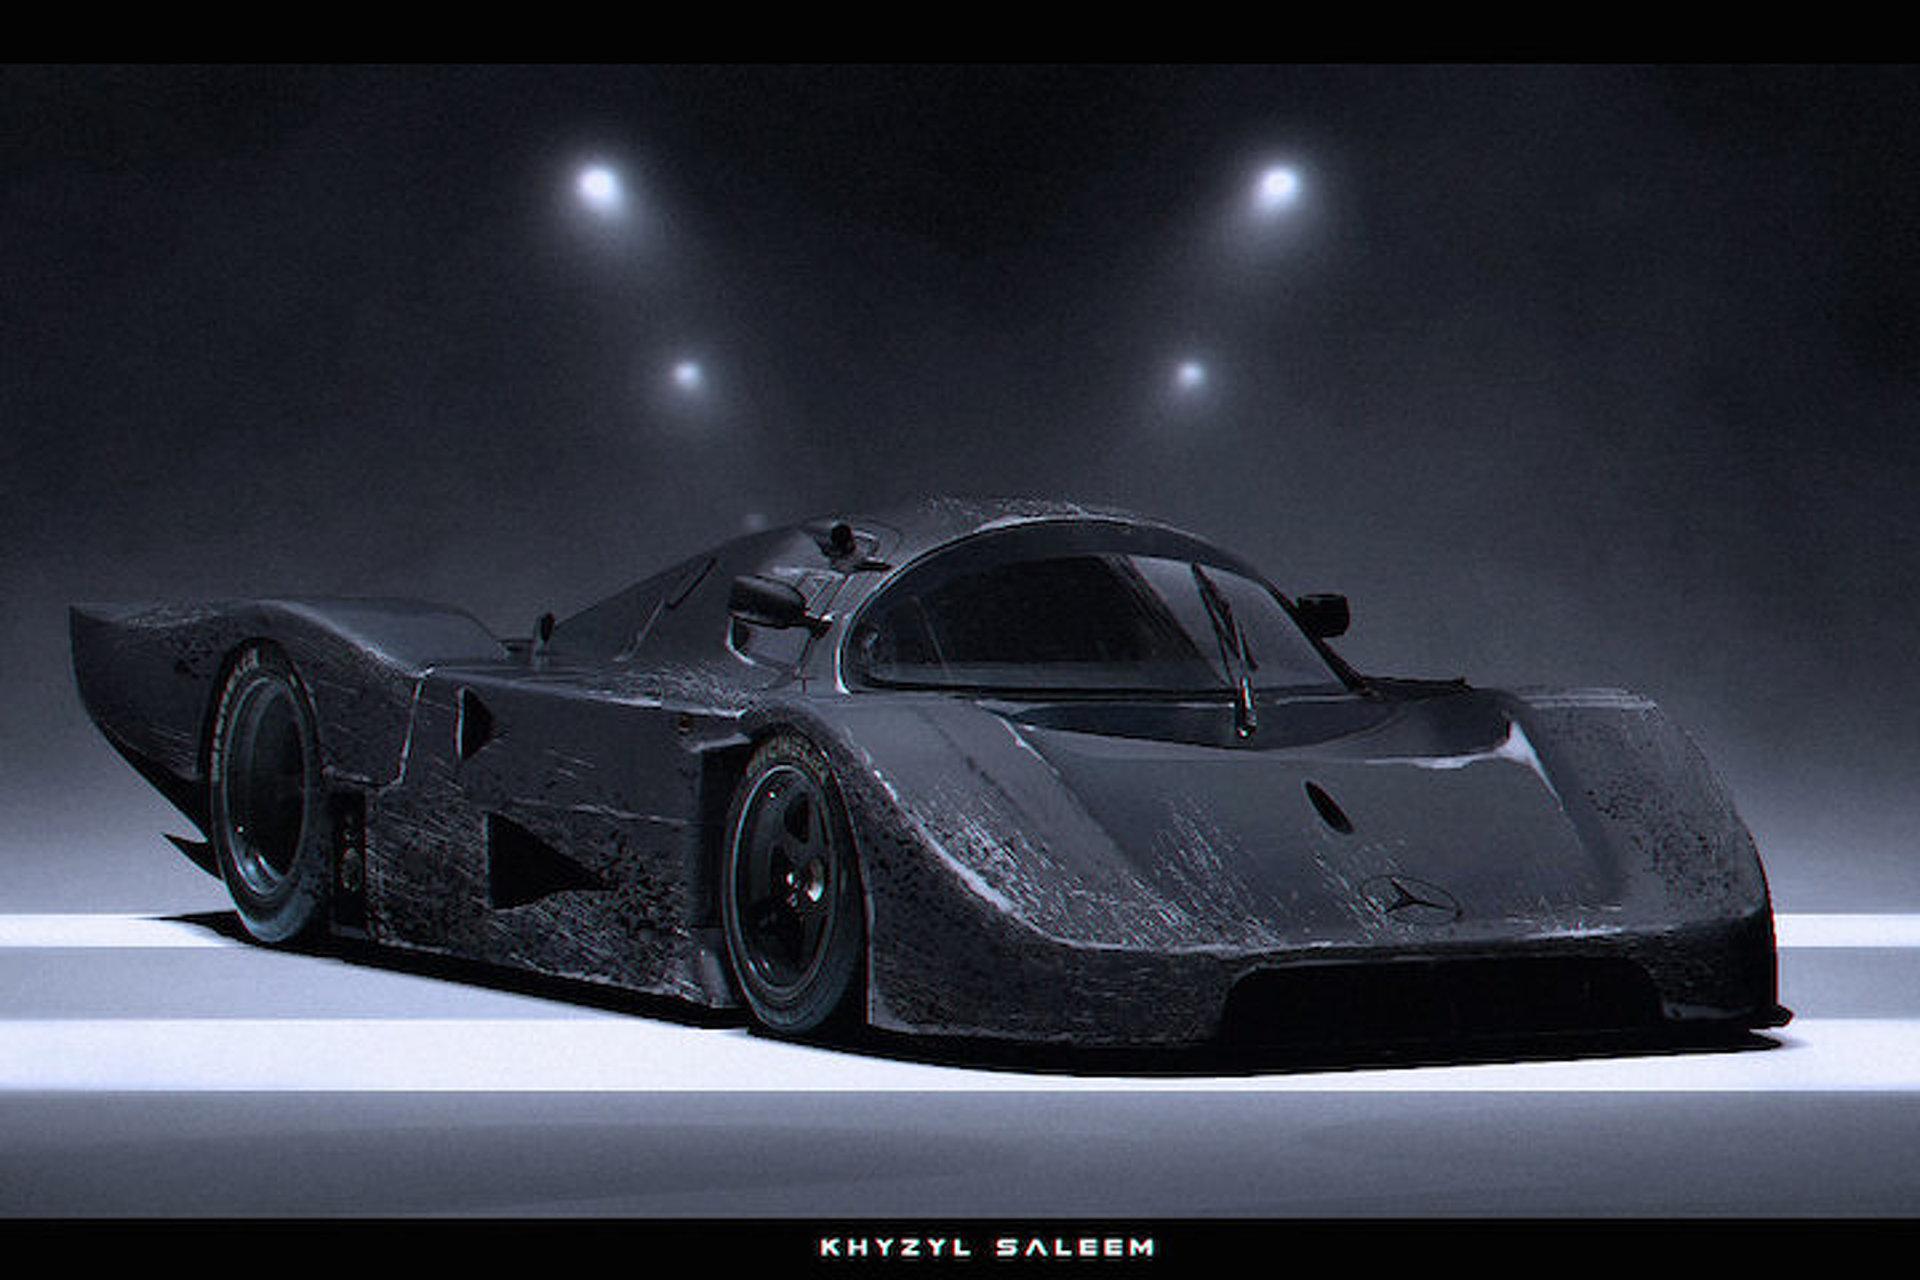 Photos Extra artist-creates-amazing-sci-fi-supercar-concepts-photo-gallery